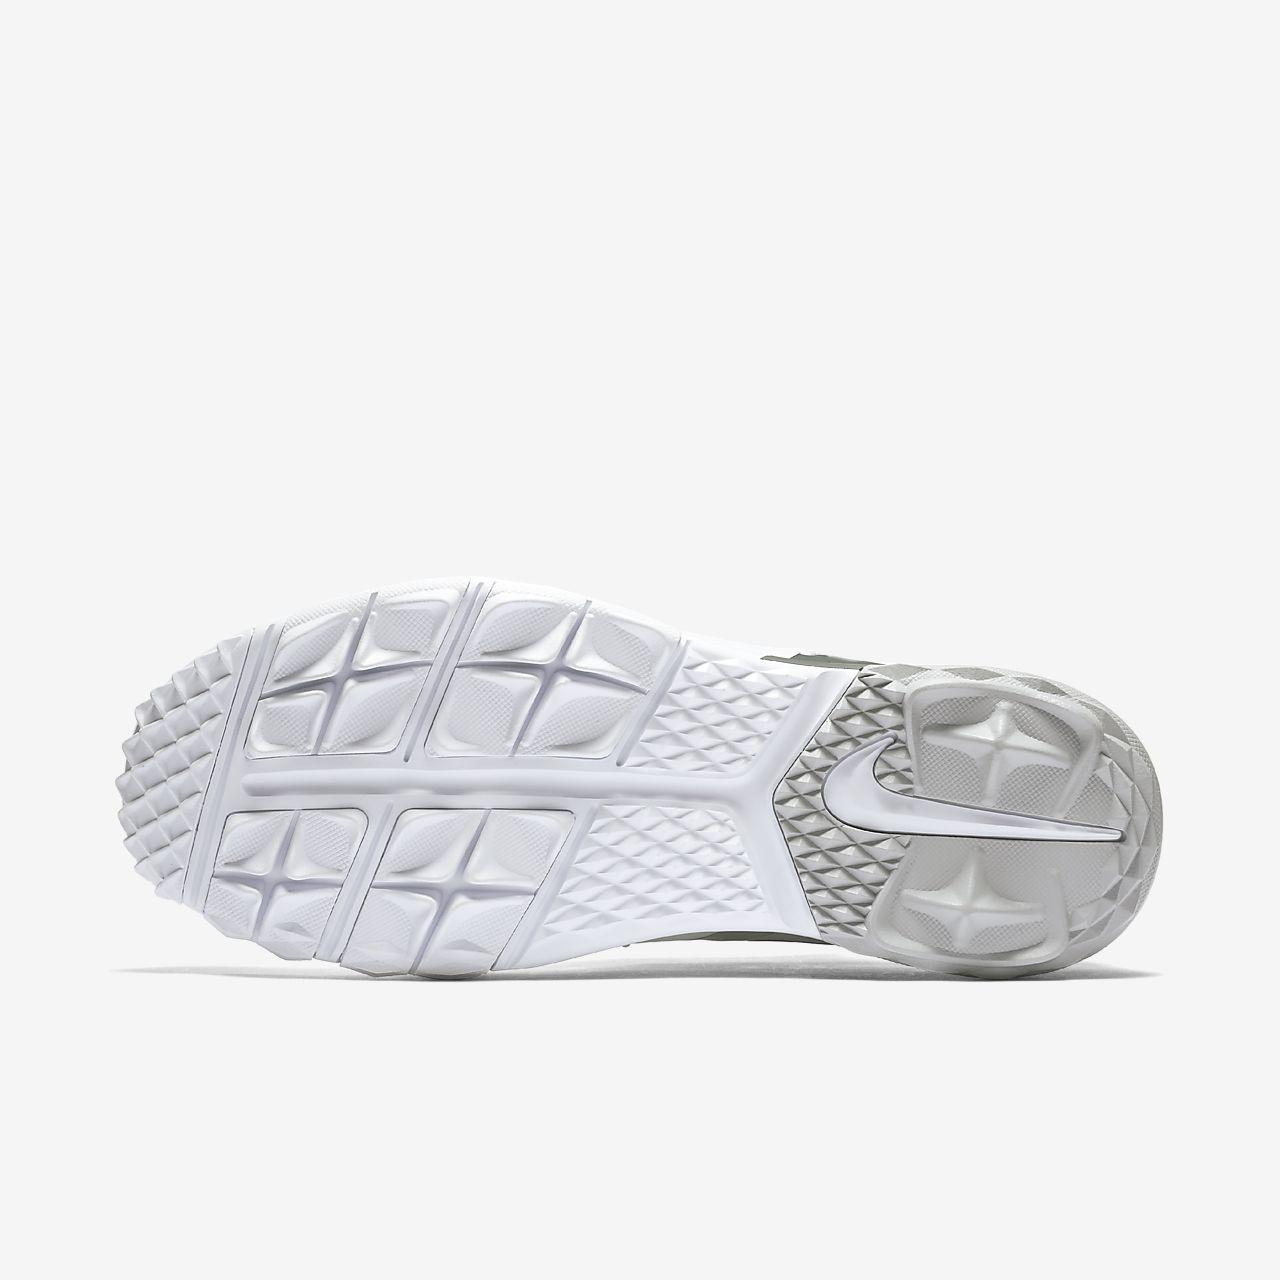 523b6f83e5d6 Nike FI Flex (Wide) Men s Golf Shoe. Nike.com SG